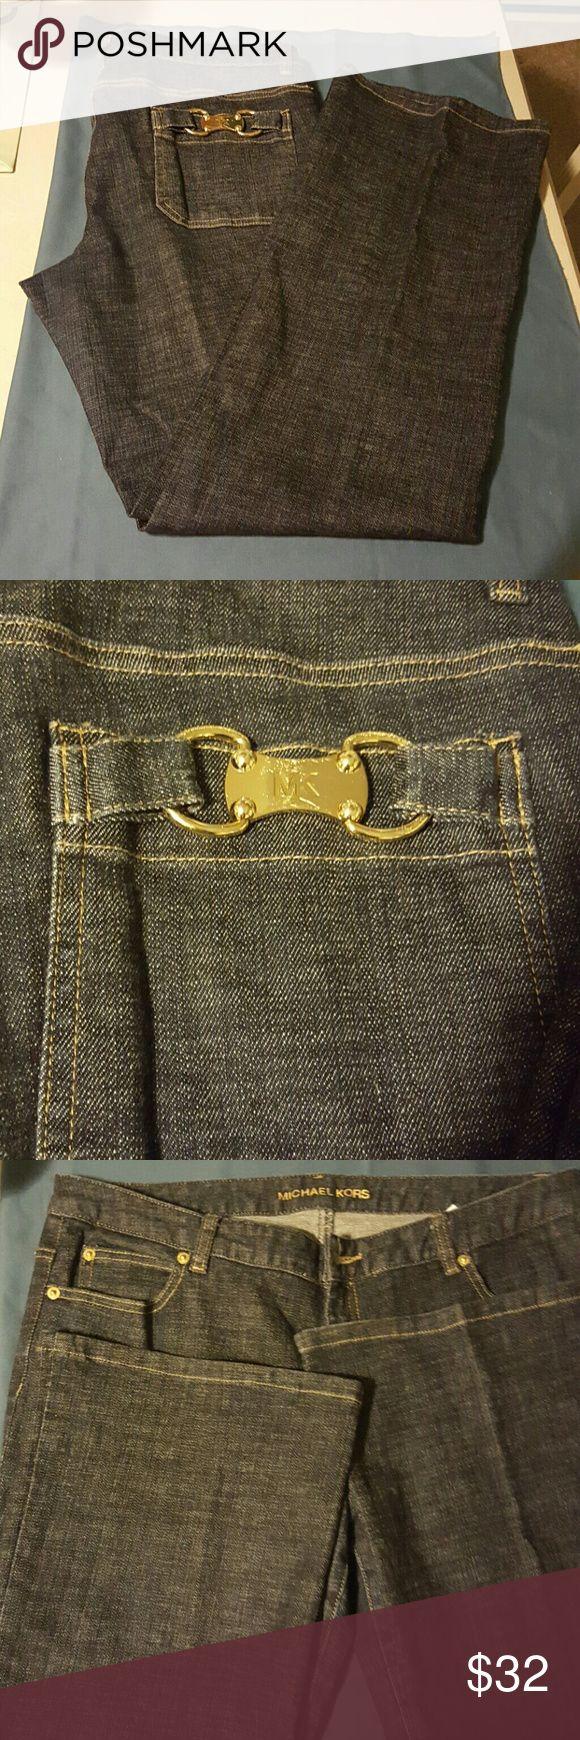 MK boot cut jeans Mint condition,  inseam32 Michael Kors Jeans